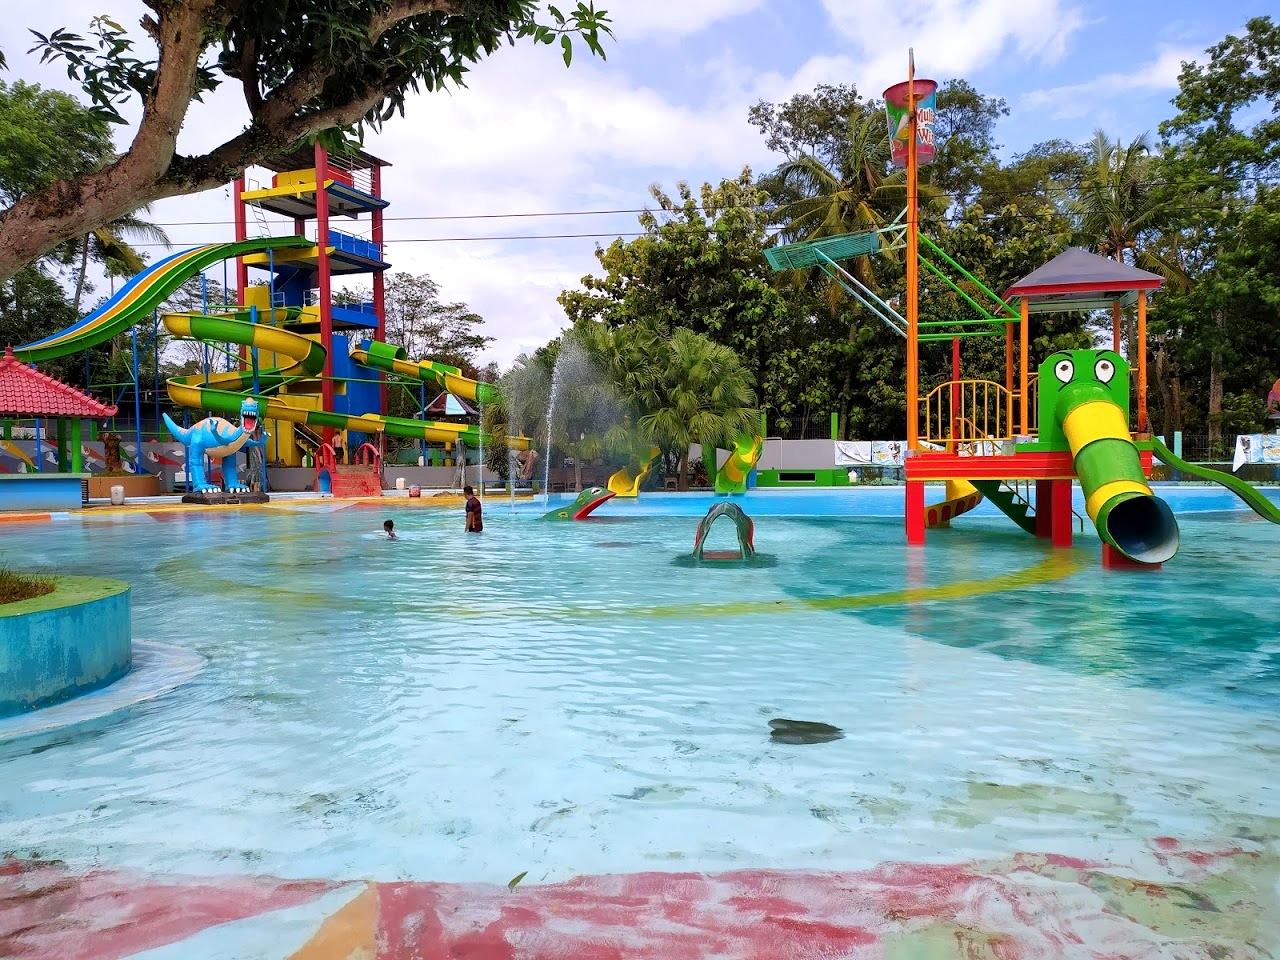 Info Harga Tiket Masuk Waterboom Mulia Wisata Kudus - Penawisata.com